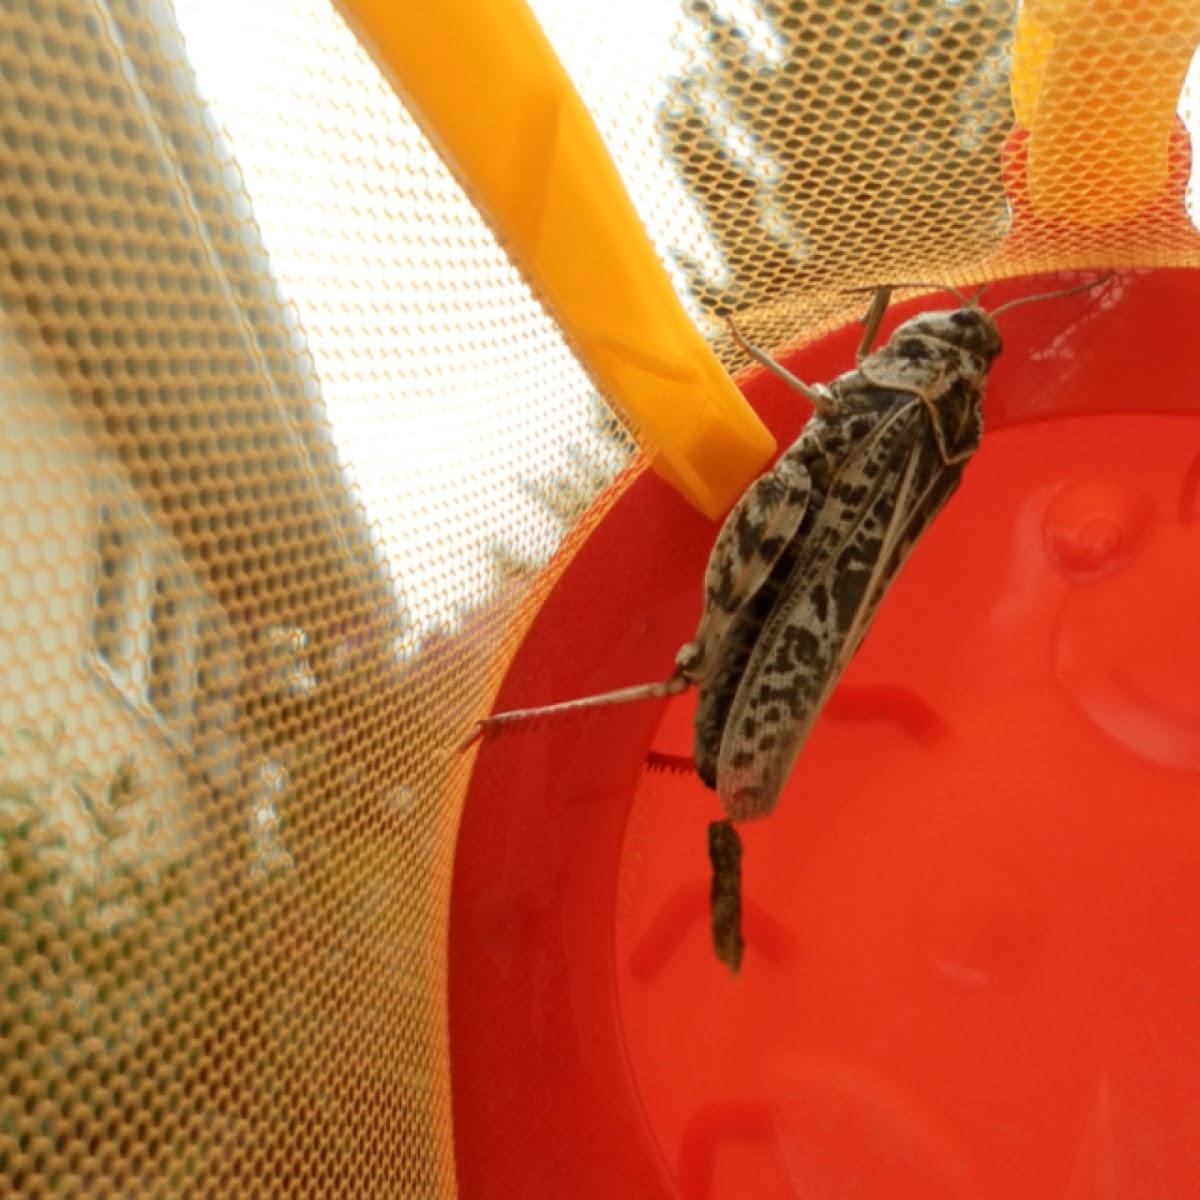 Montana Bandwing Grasshopper